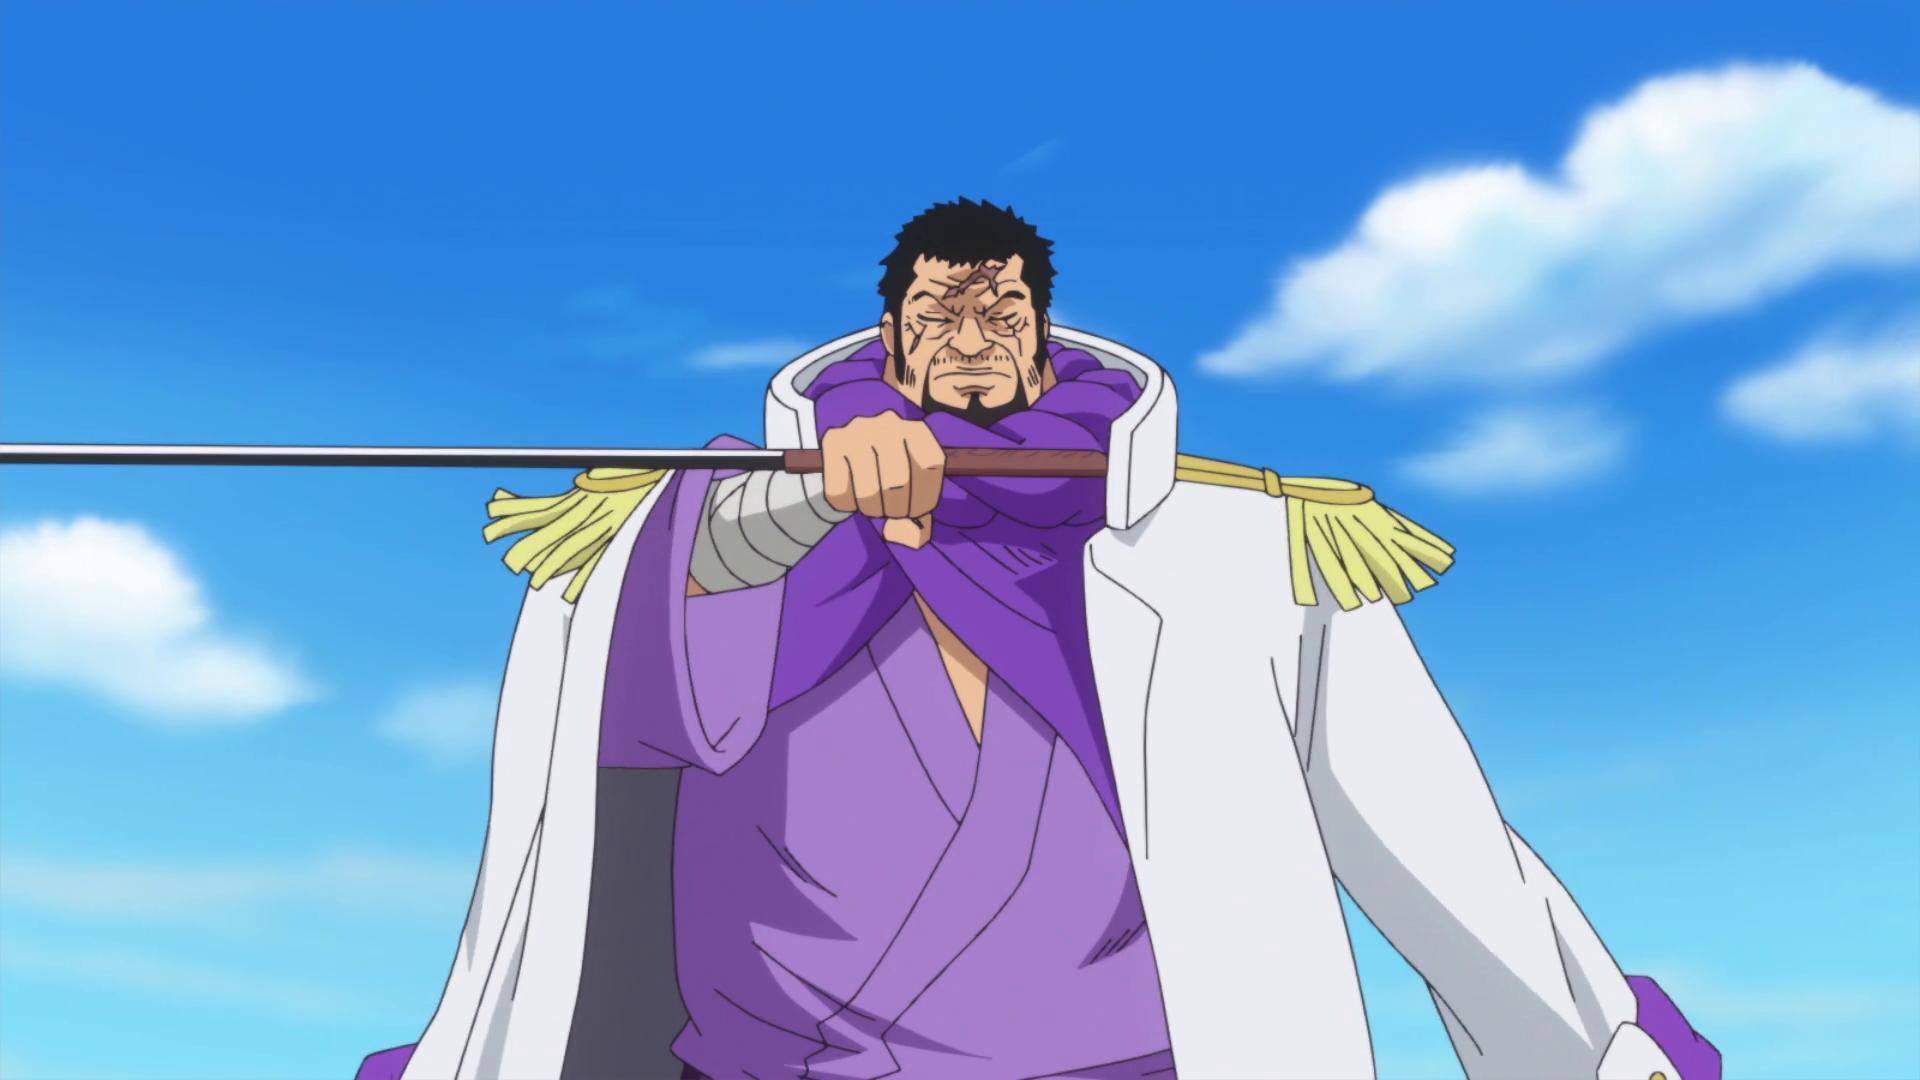 Admiral Fujitora holding a sword sideways